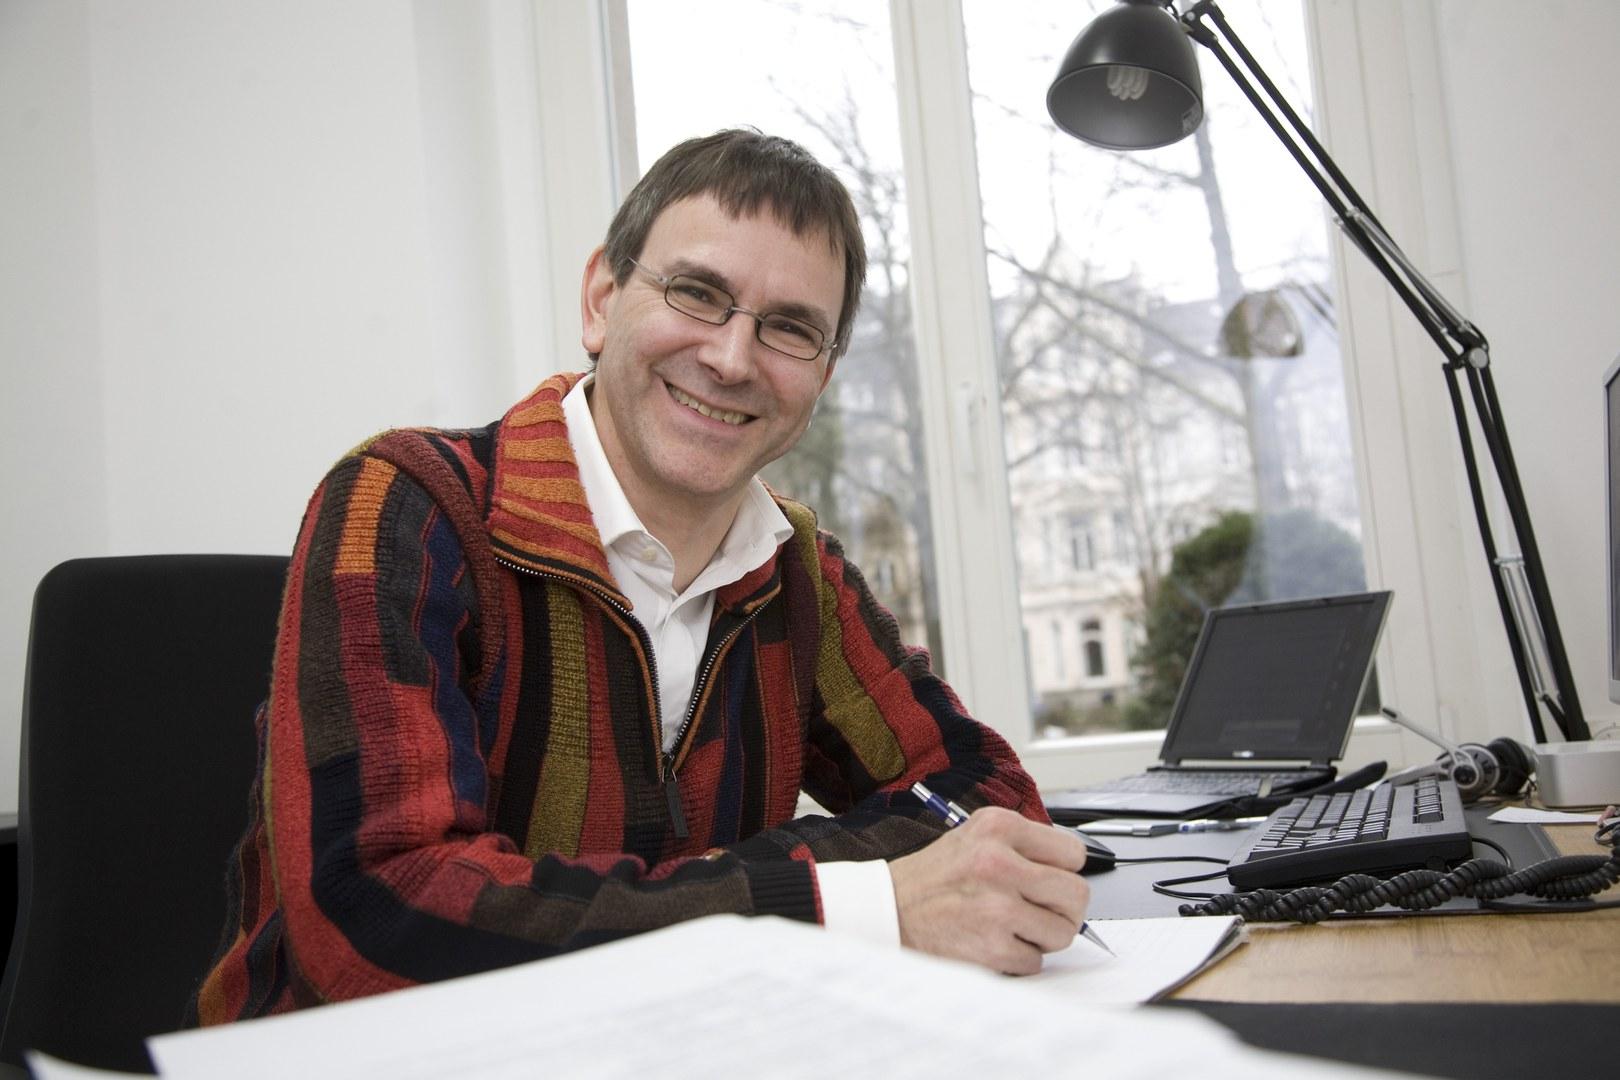 Bild Prof. Dr. Stefan Müller übernimmt ersten Hausdorff Chair